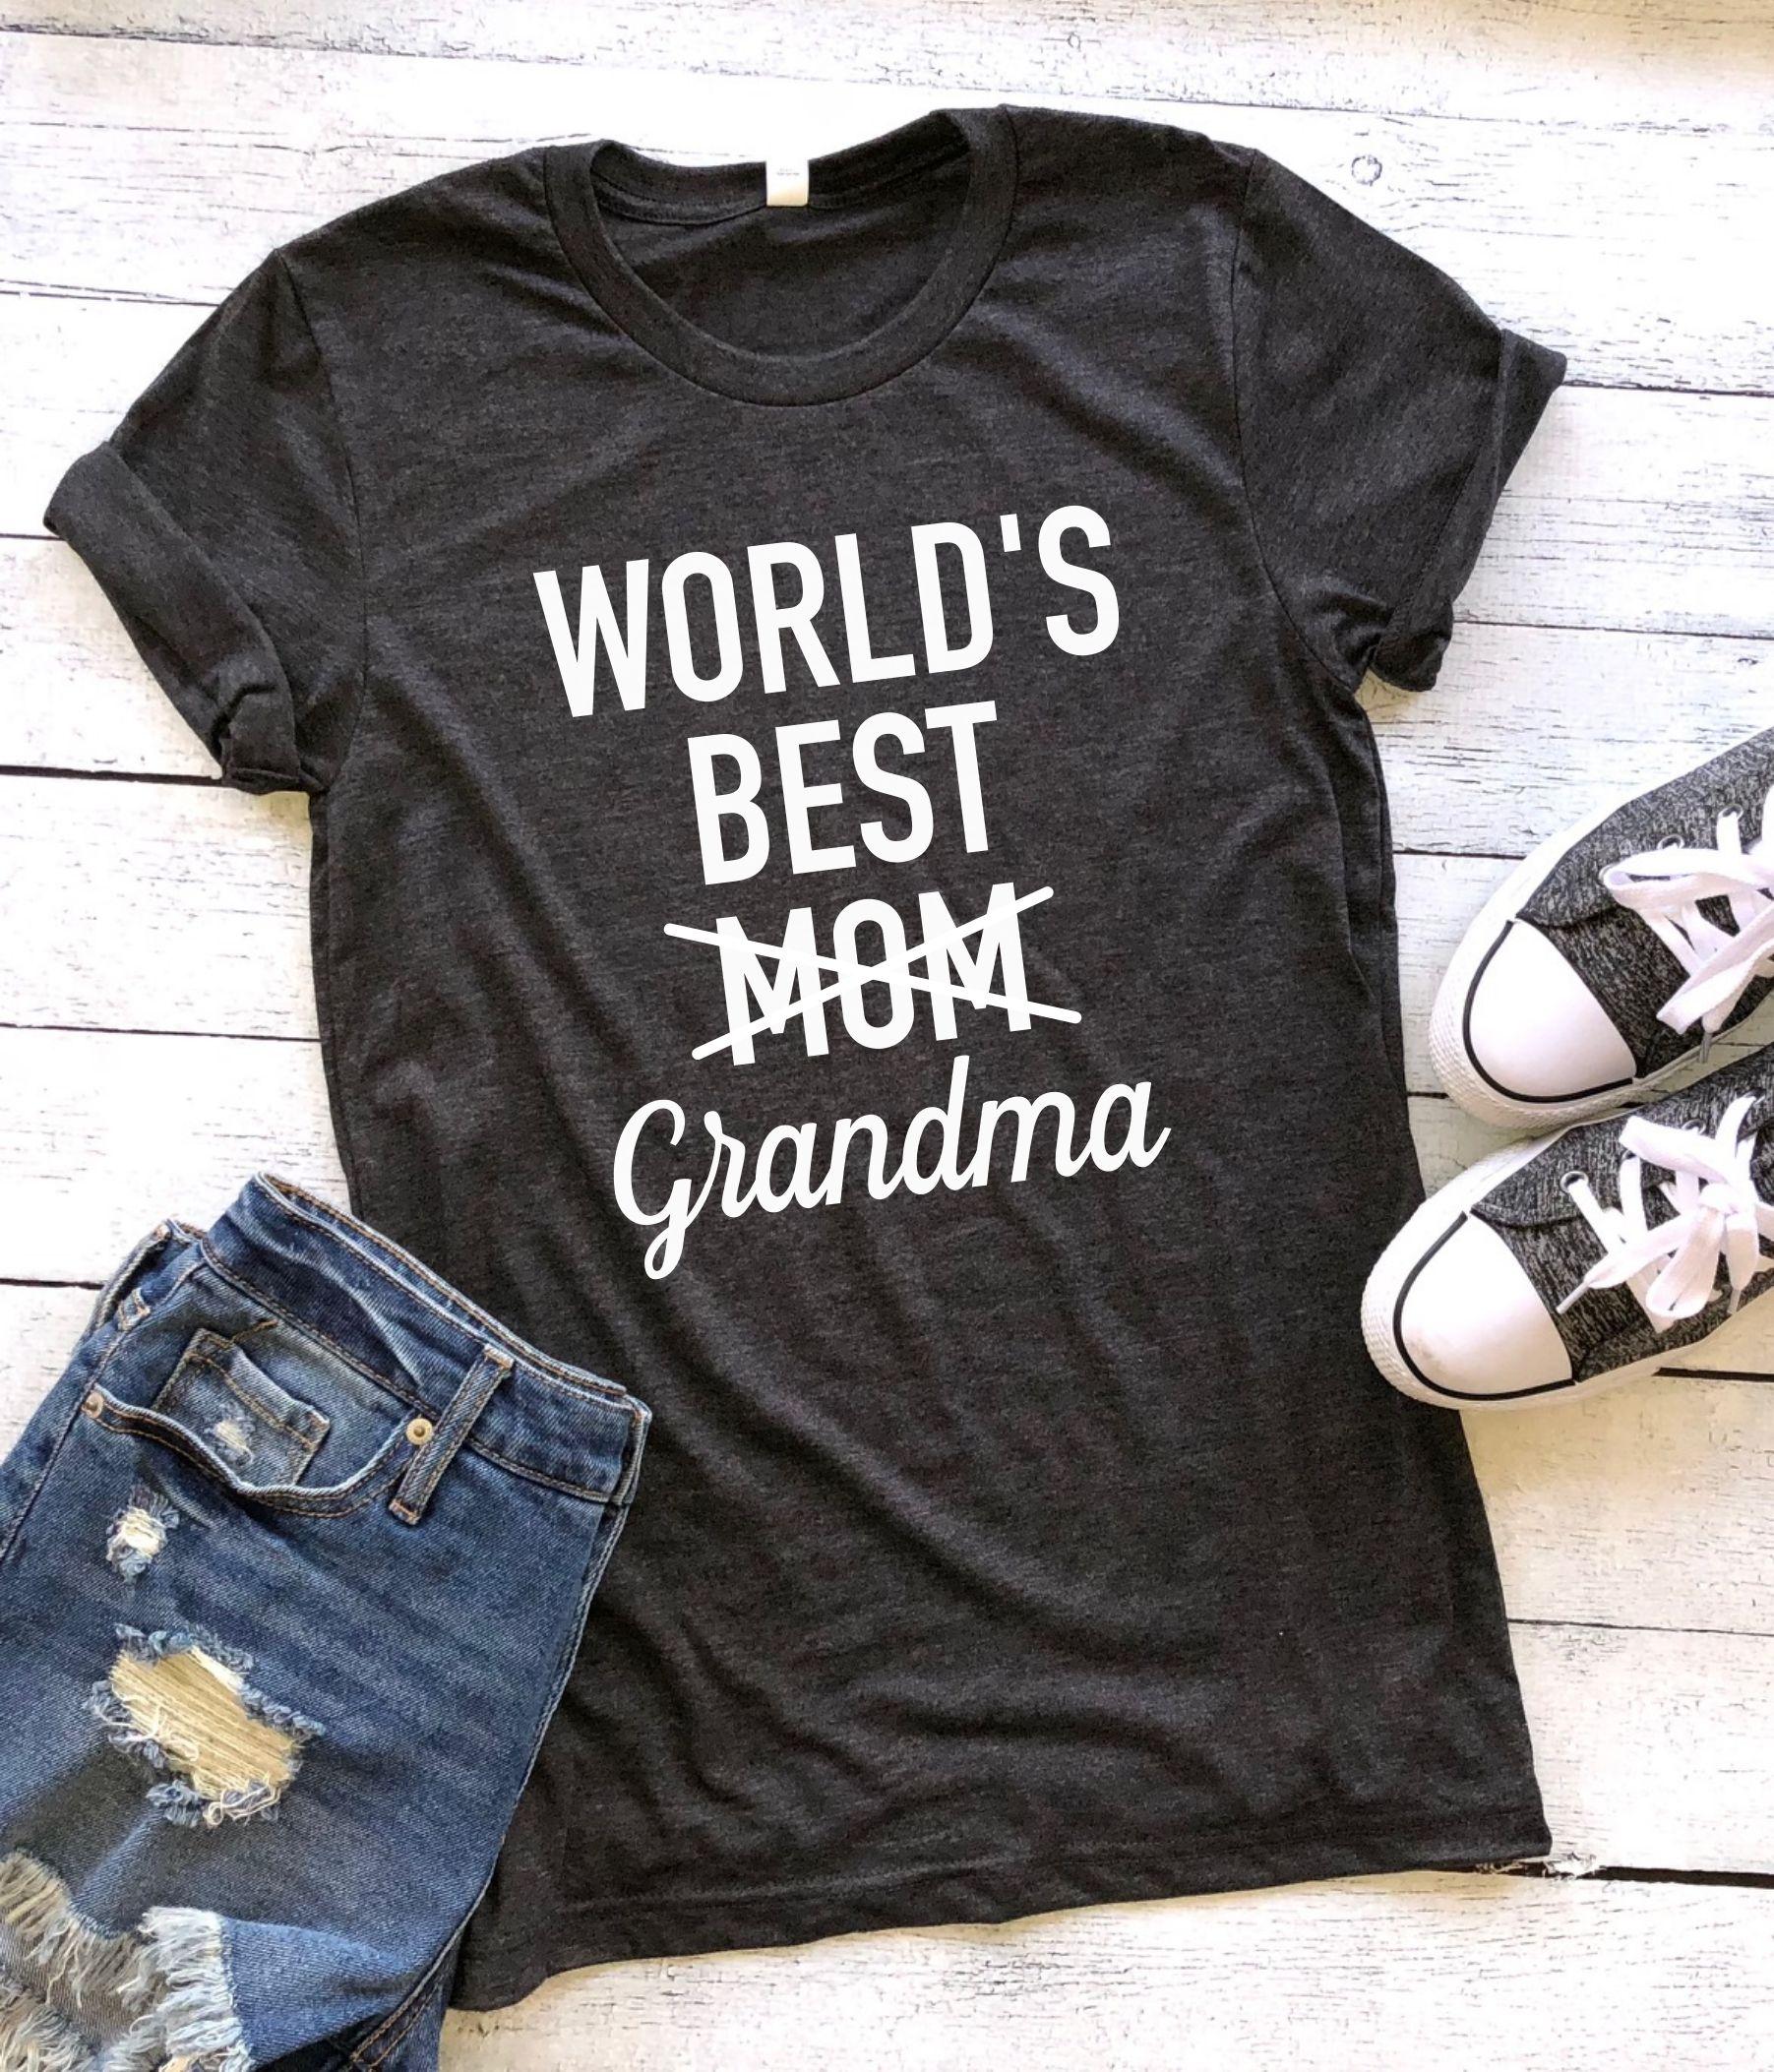 a115cd9f8 World's best mom/grandma (crewneck), pregnancy announcement grandparents, pregnancy  reveal grandparents, future grandparents, gift for future grandma, ...